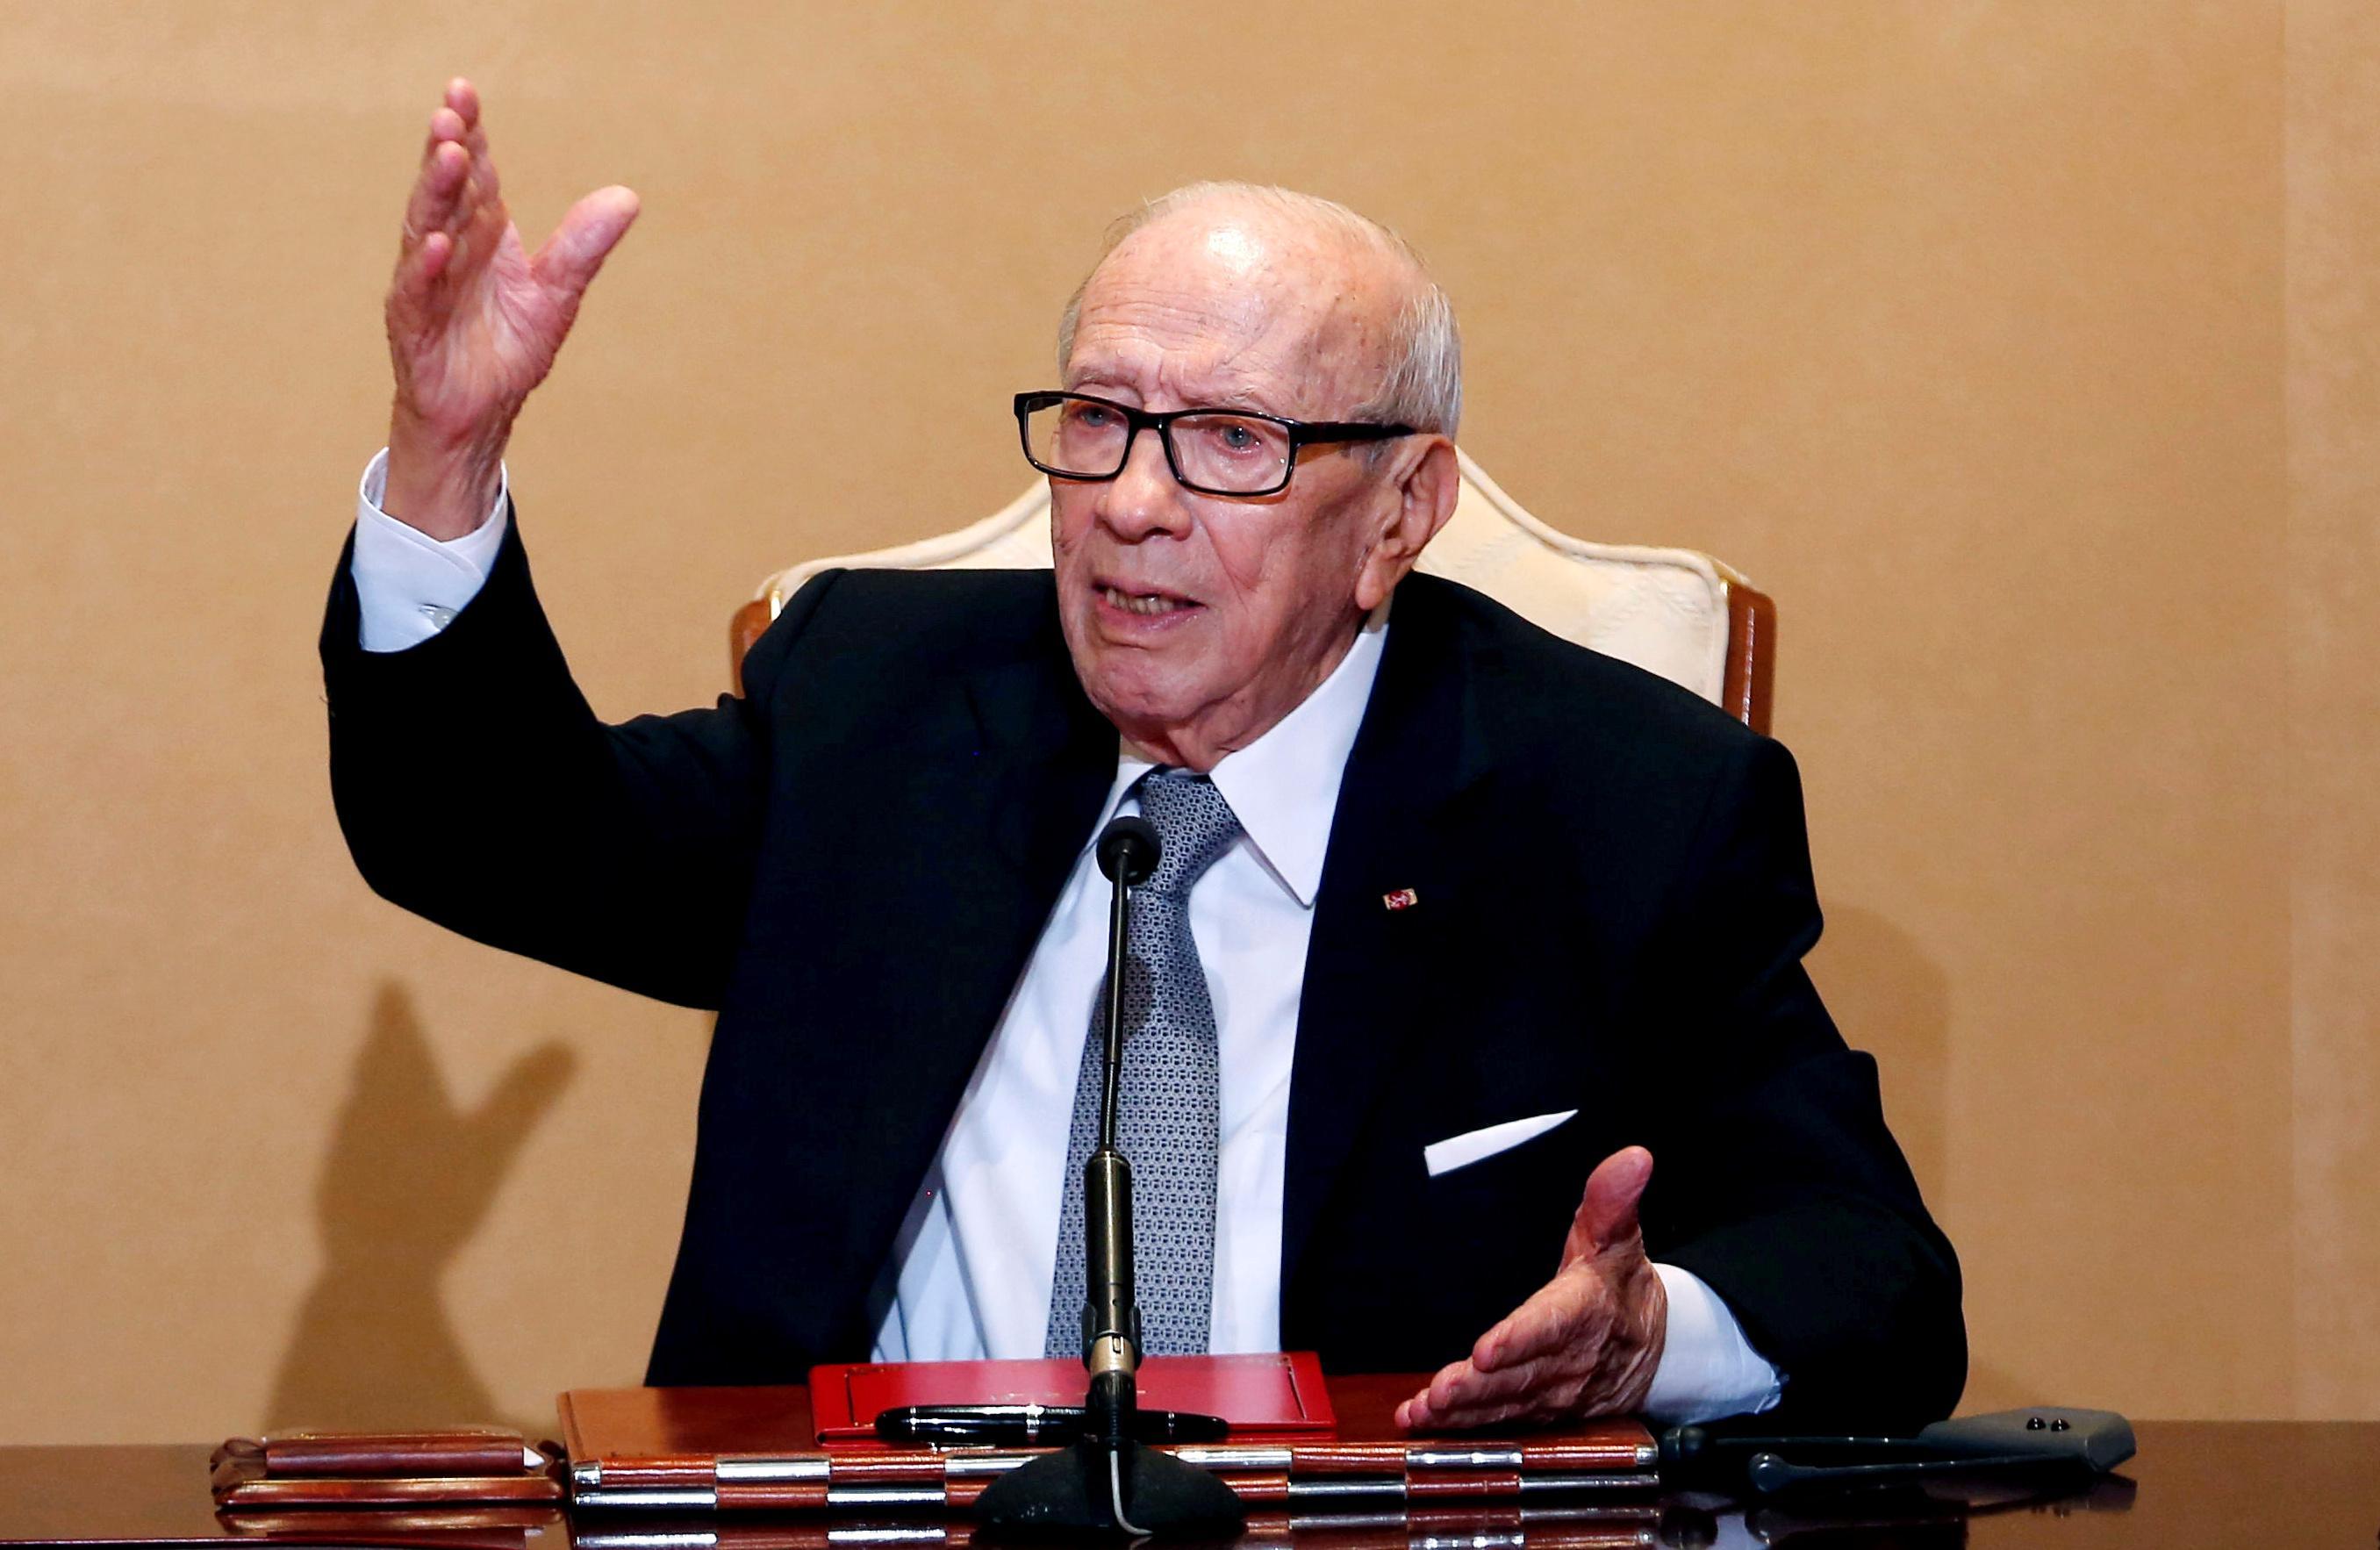 Tunisian president hospitalized 'in severe health crisis': presidency